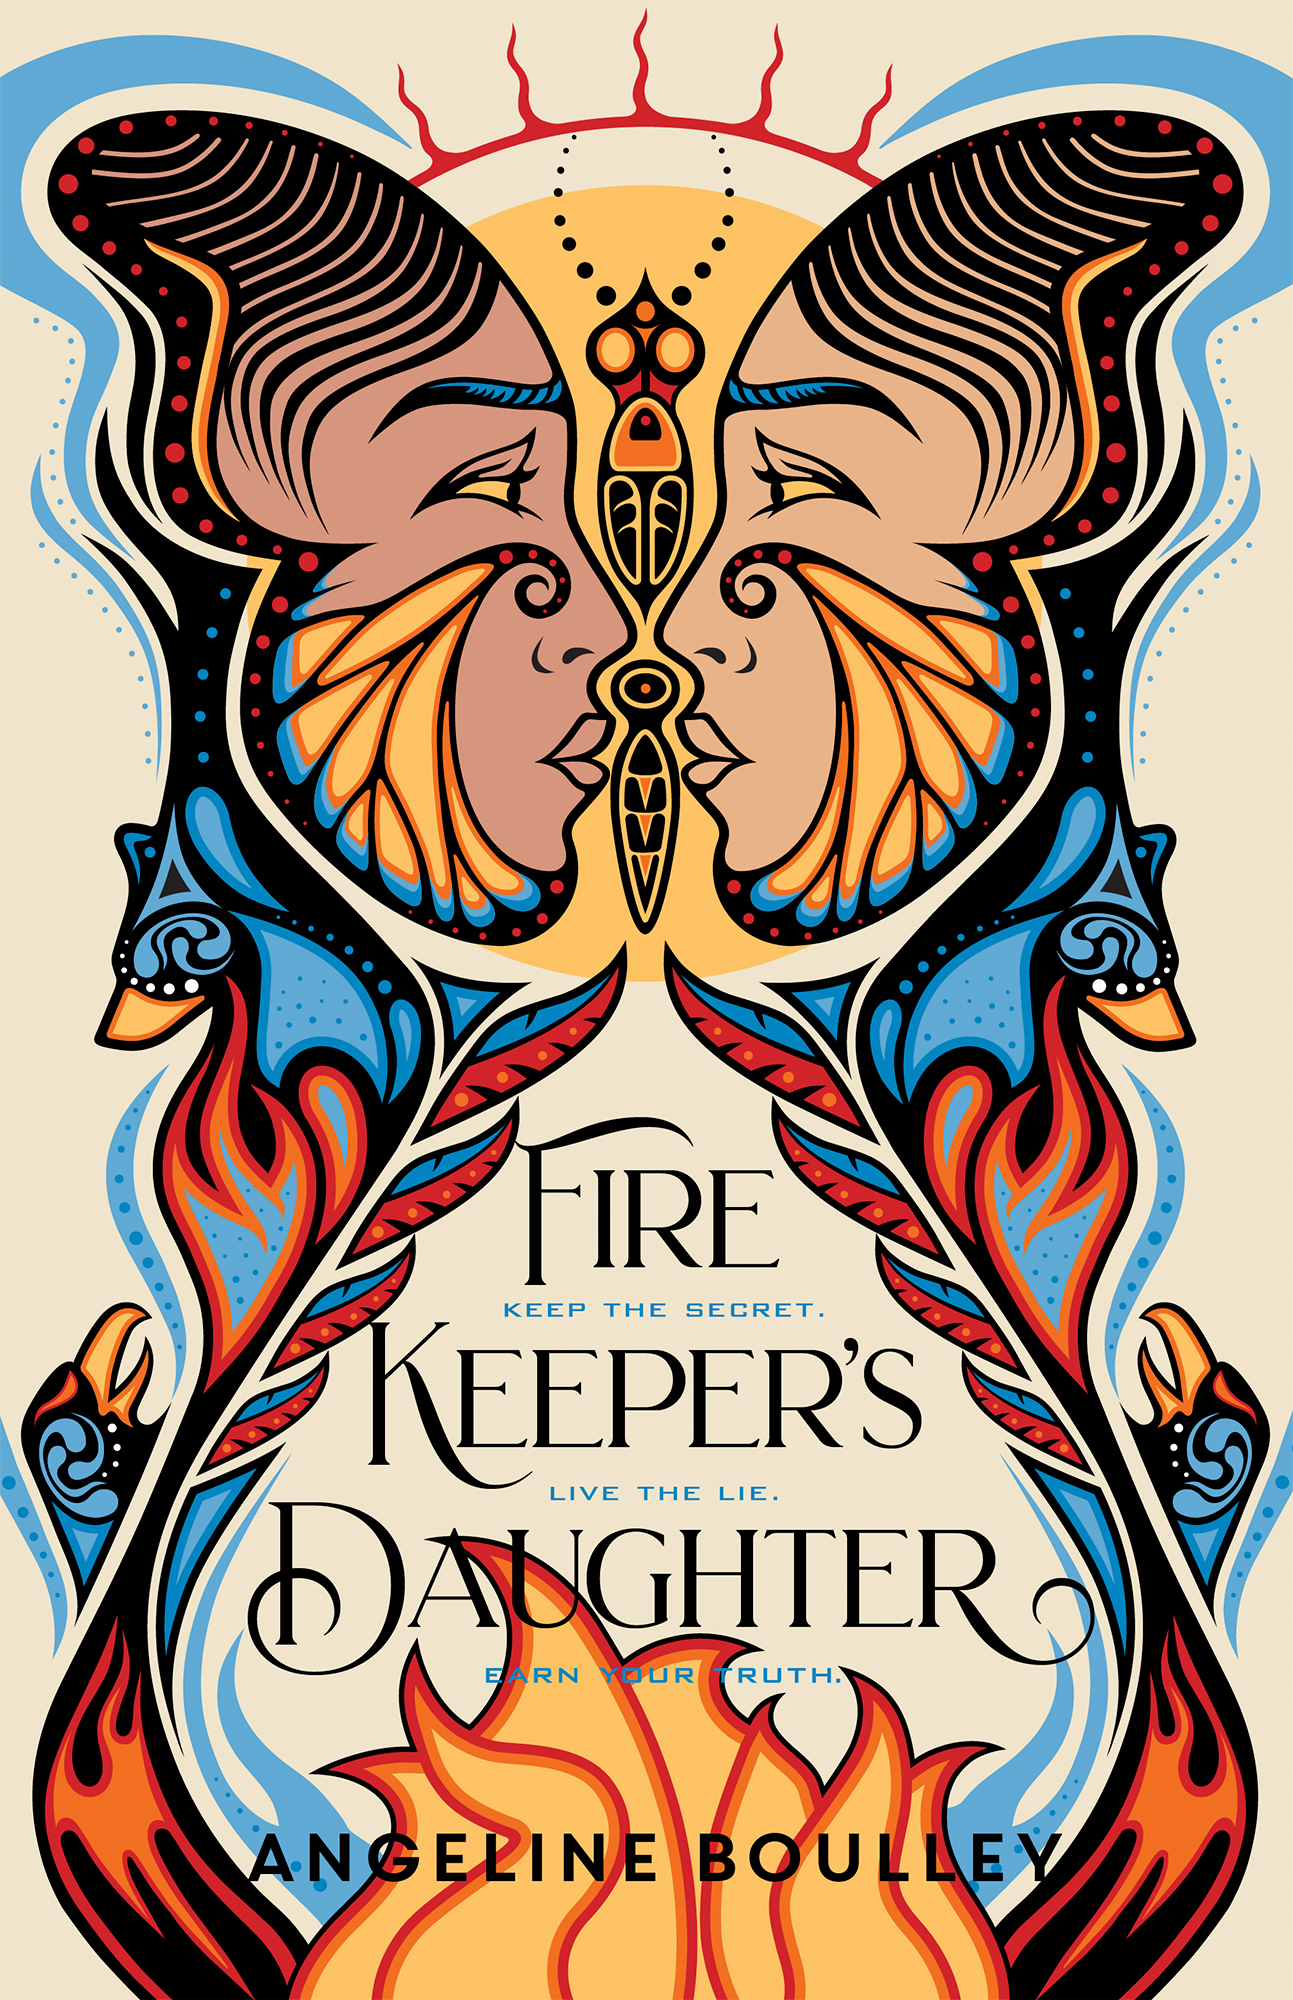 Firekeepers Daughter final 7.12